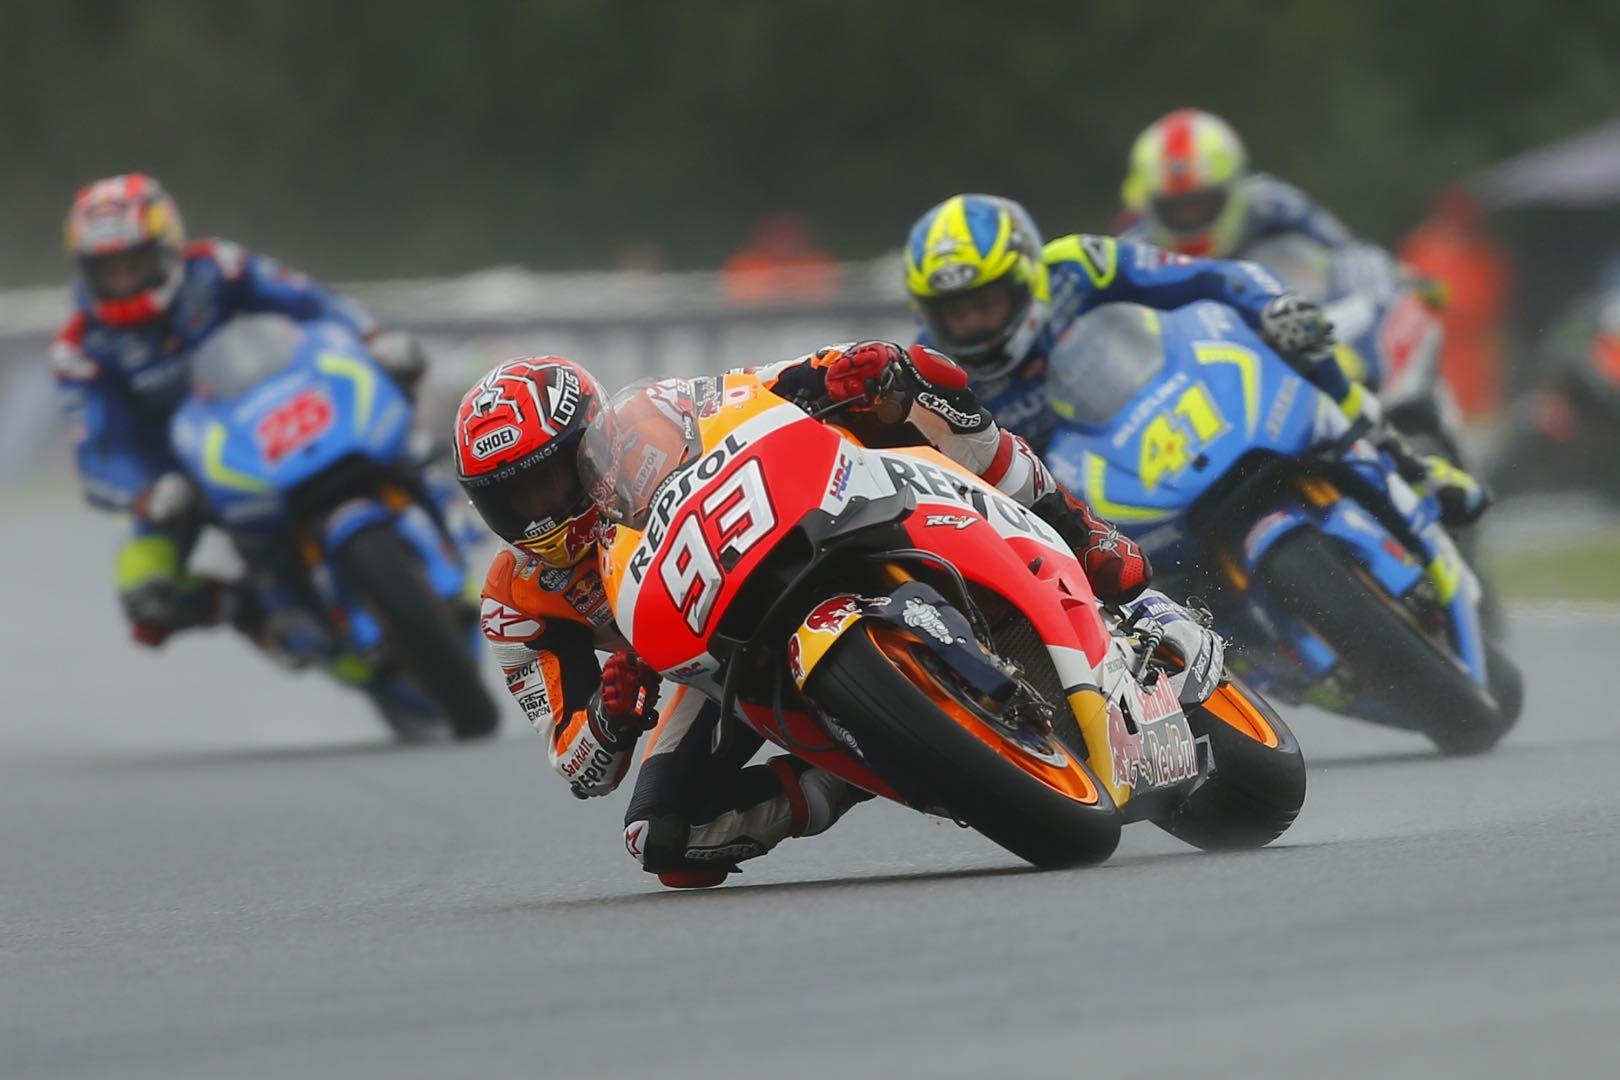 2016 Brno MotoGP Results Honda's Marc Marquez